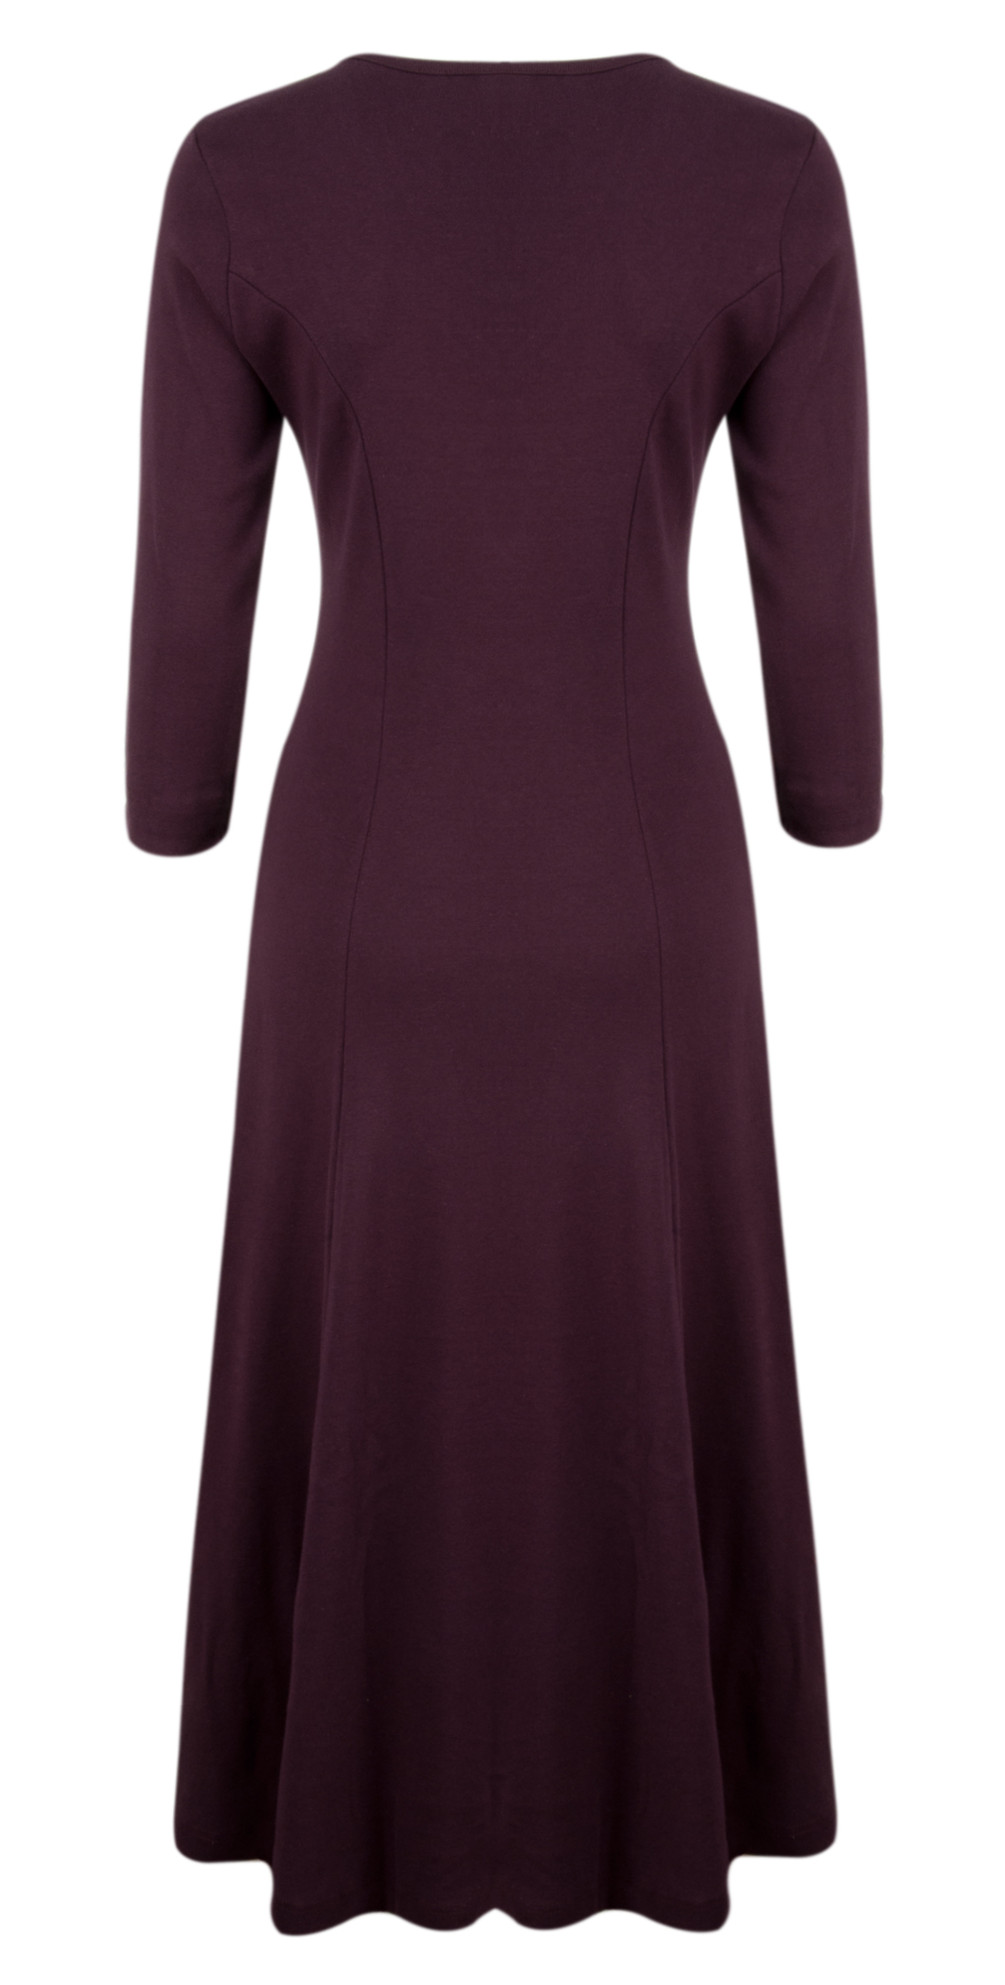 Maxine Dress main image